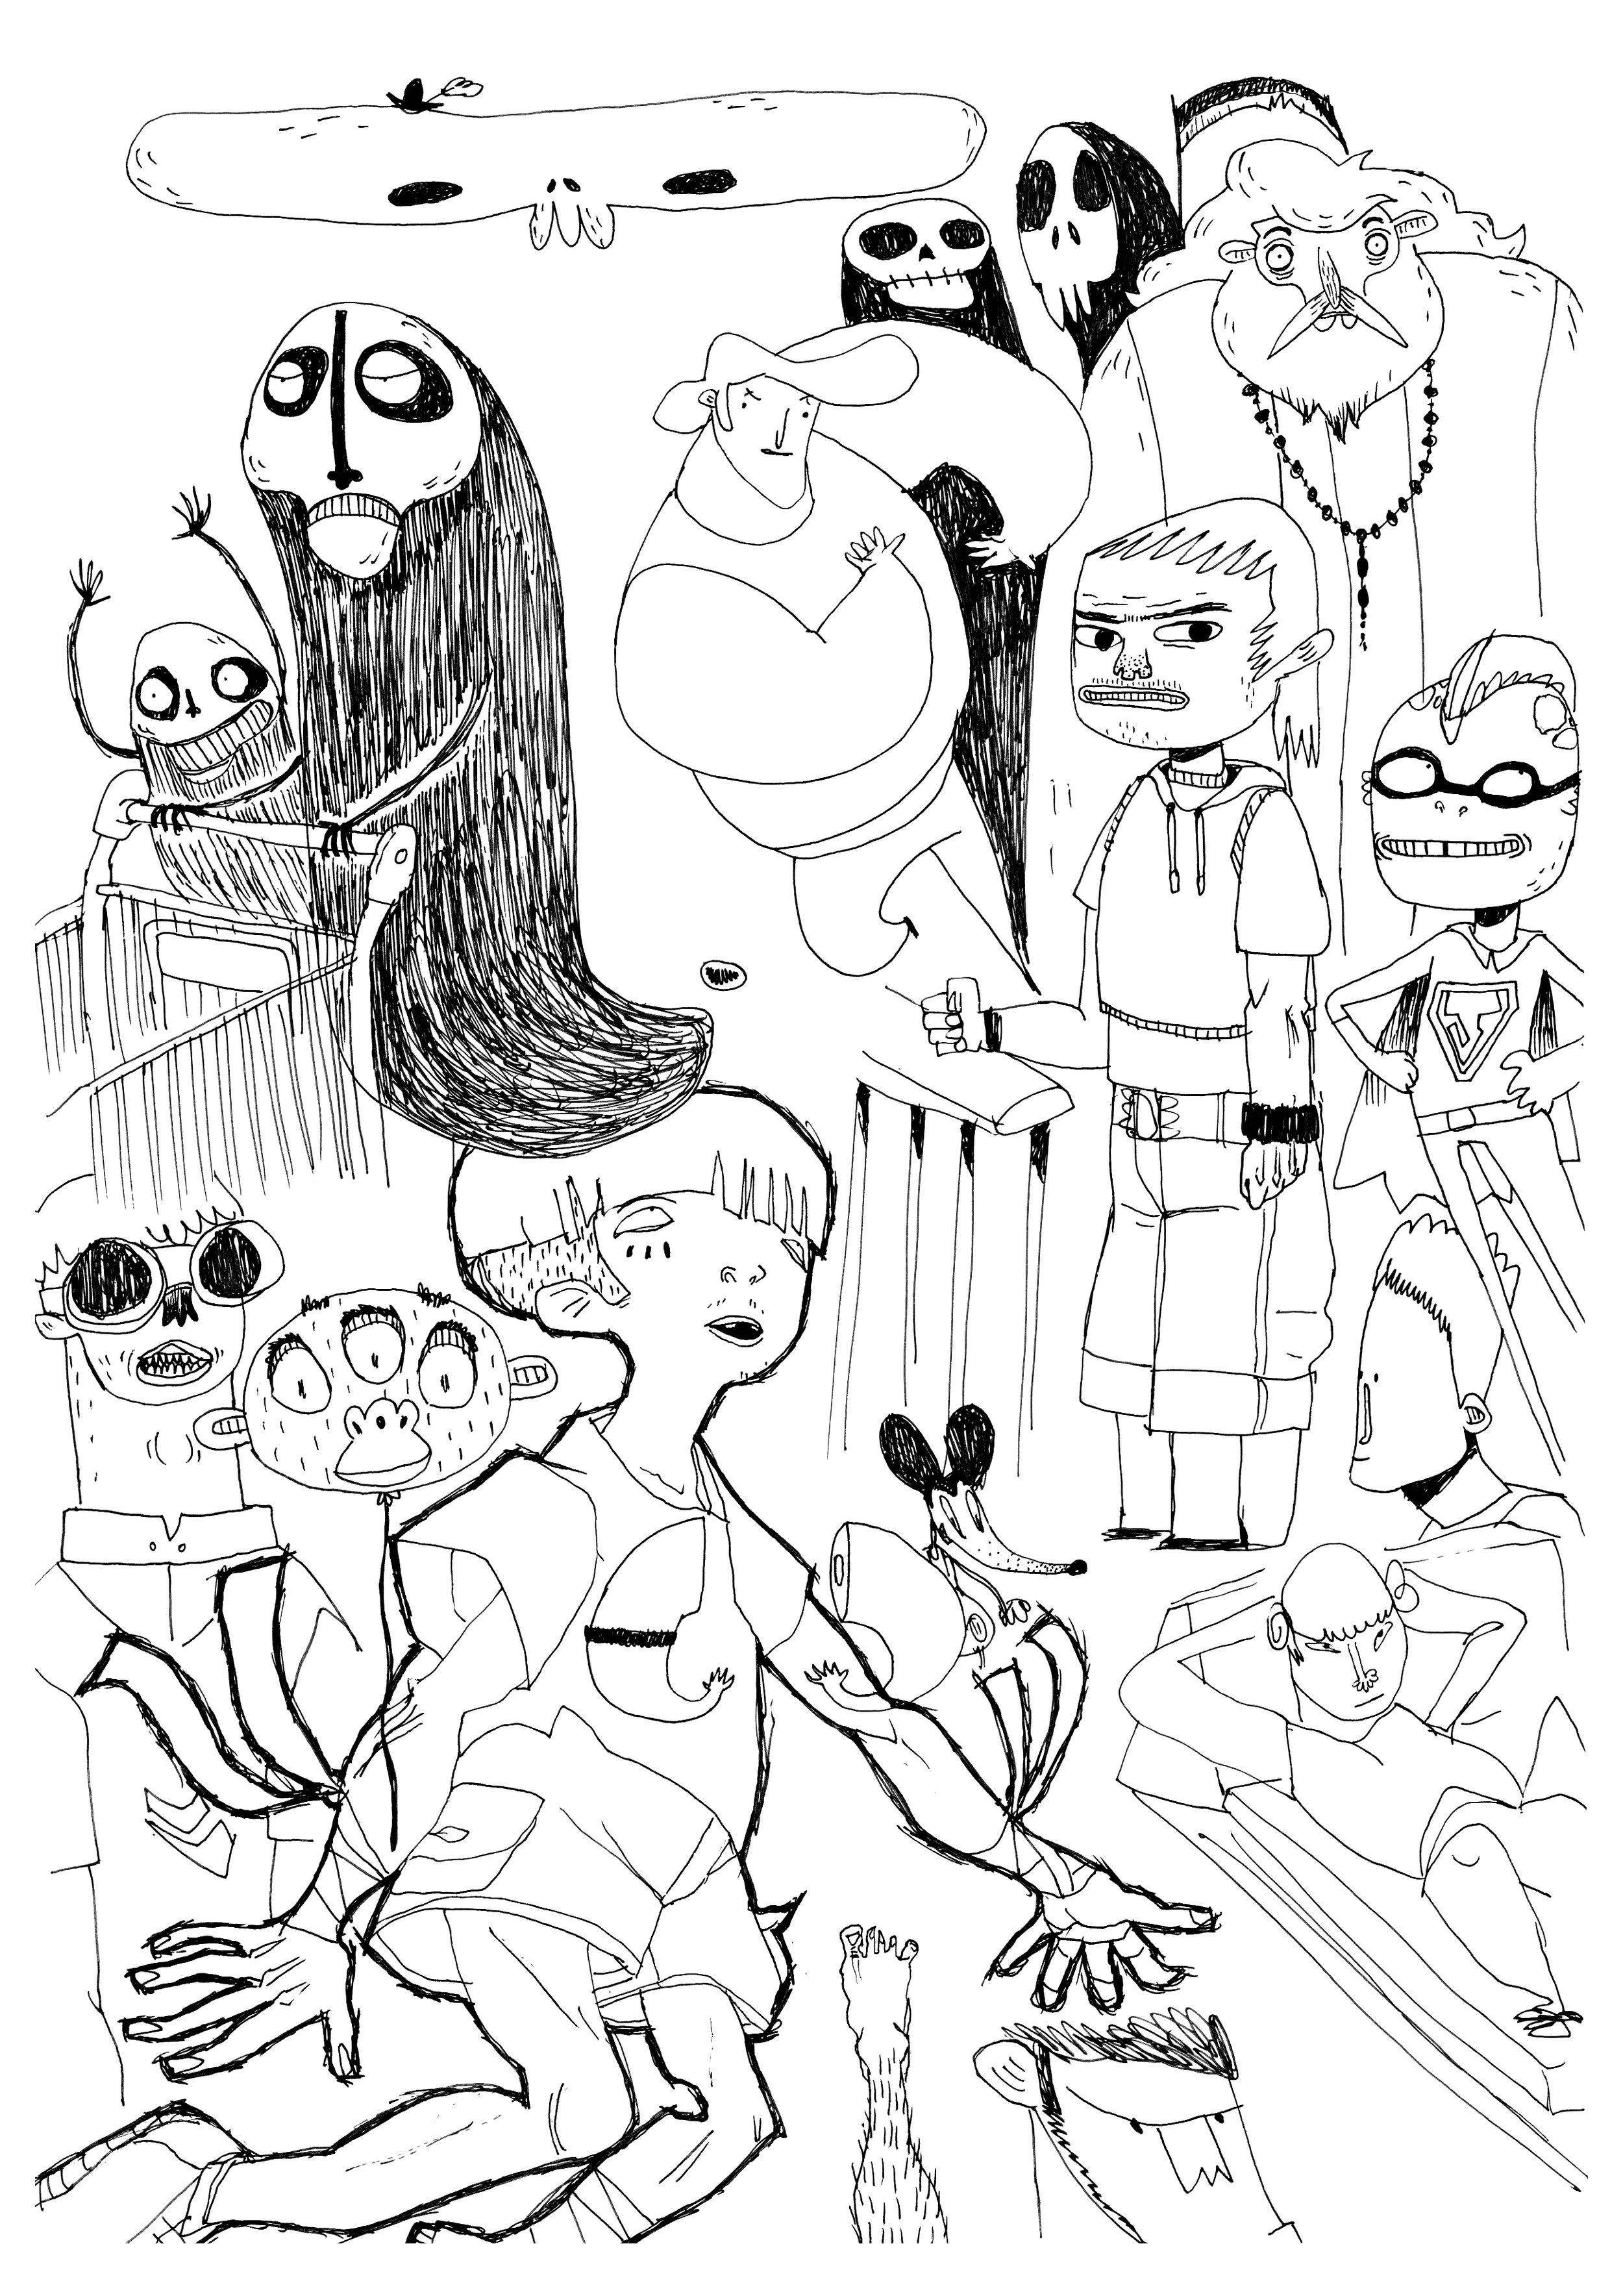 Pascal_Zaffiro_Doodle_18.jpg